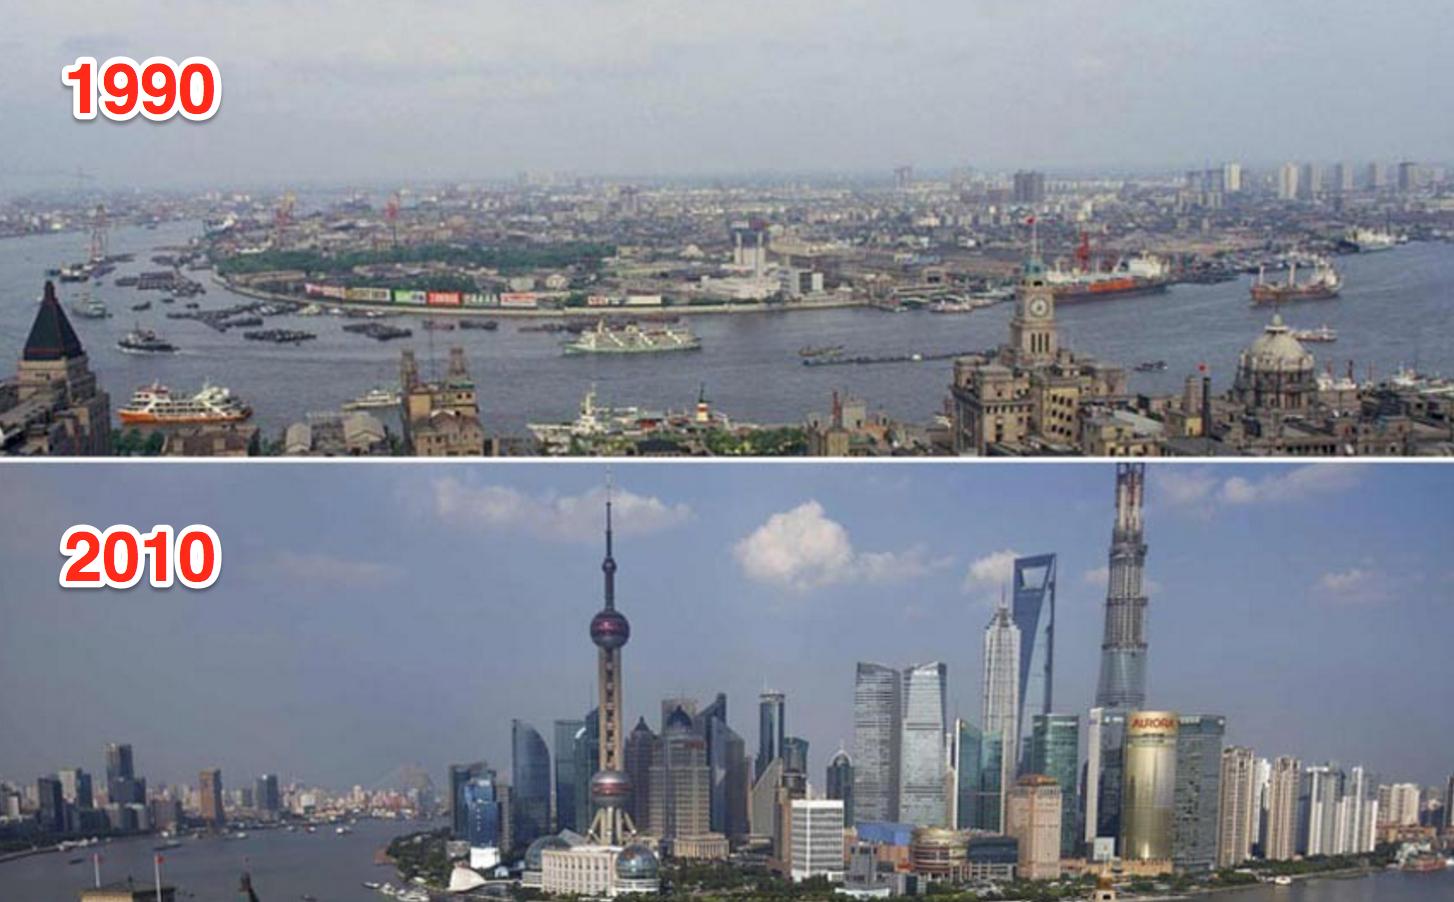 Shanghai_1990_vs_2010.png